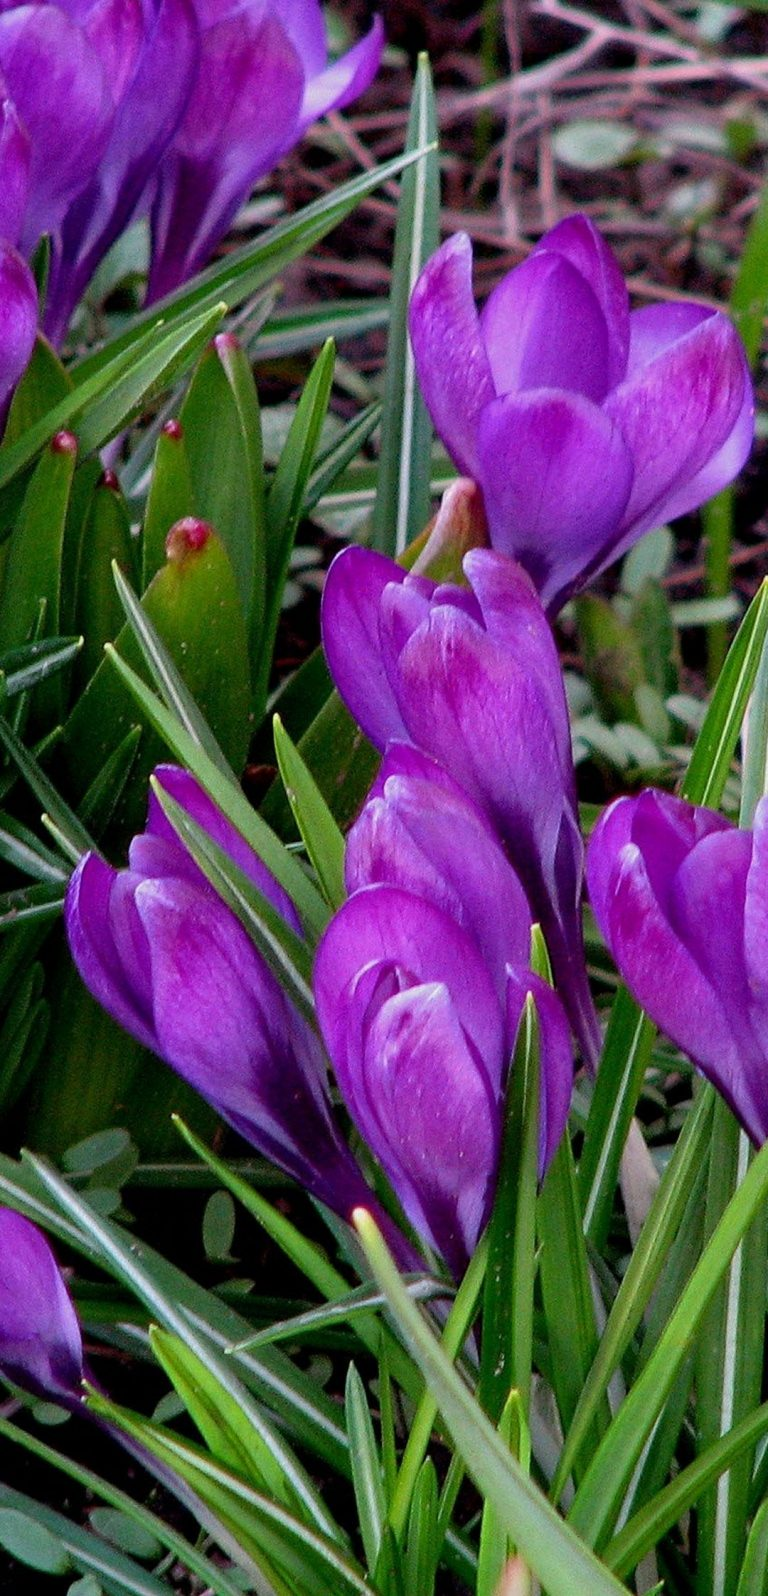 Snowdrops Spring Grass 1080x2244 768x1596